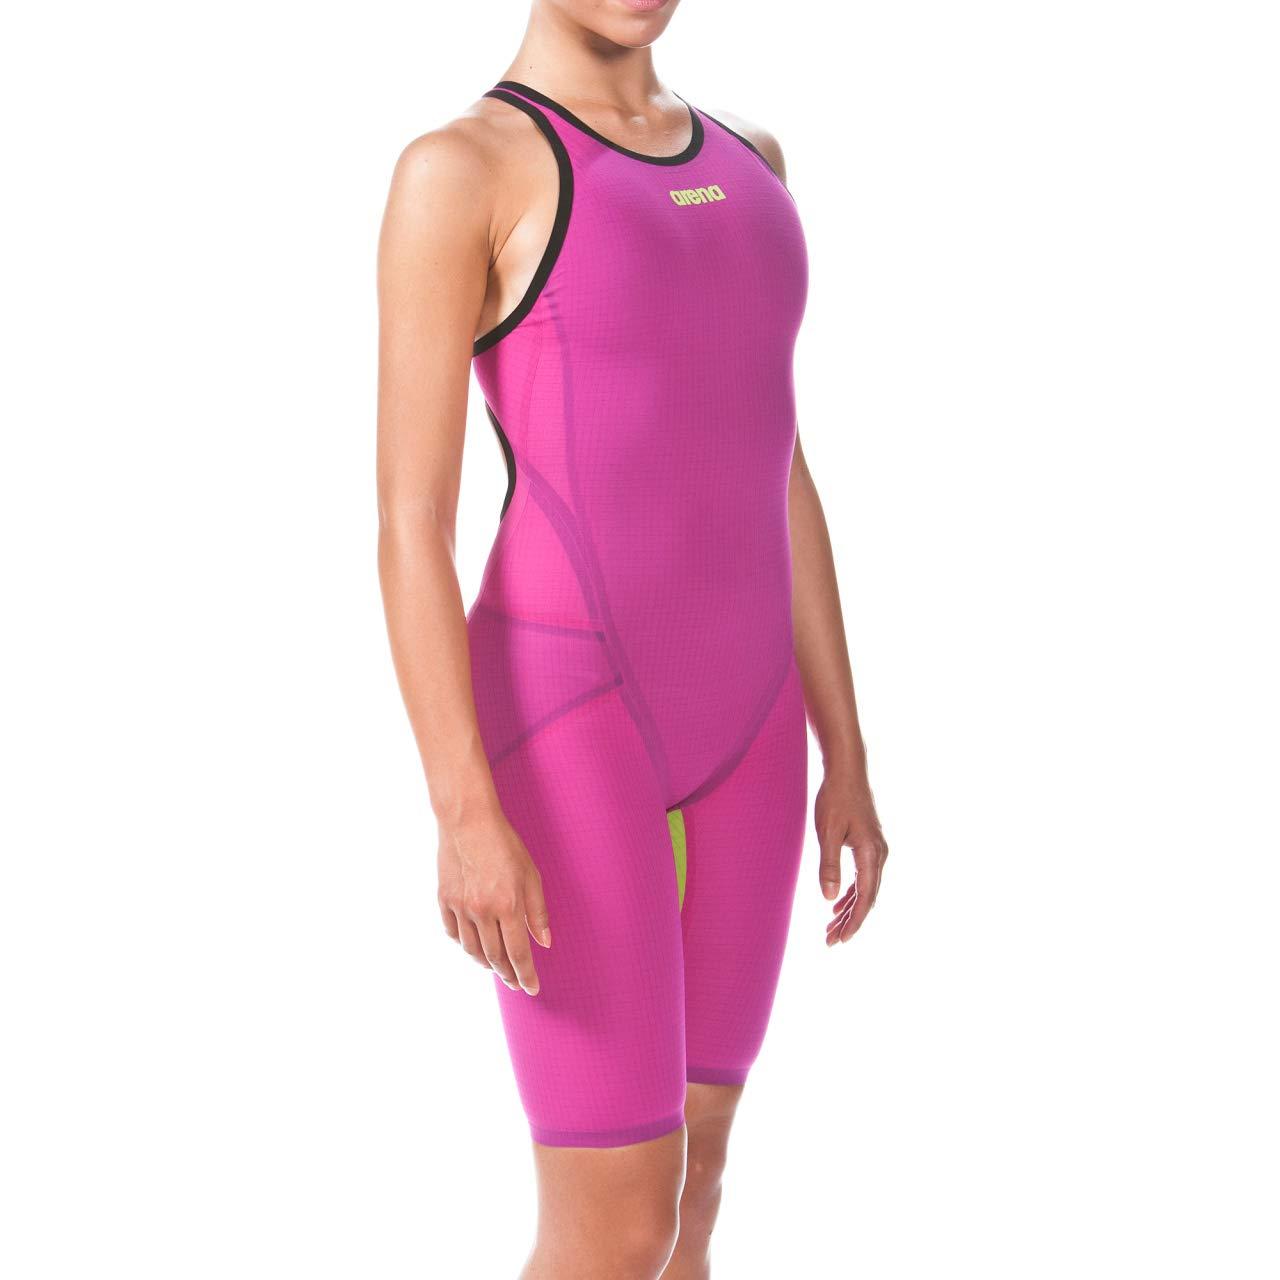 Arena Powerskin Carbon Flex VX FBSL Open Back Womens Racing Suit